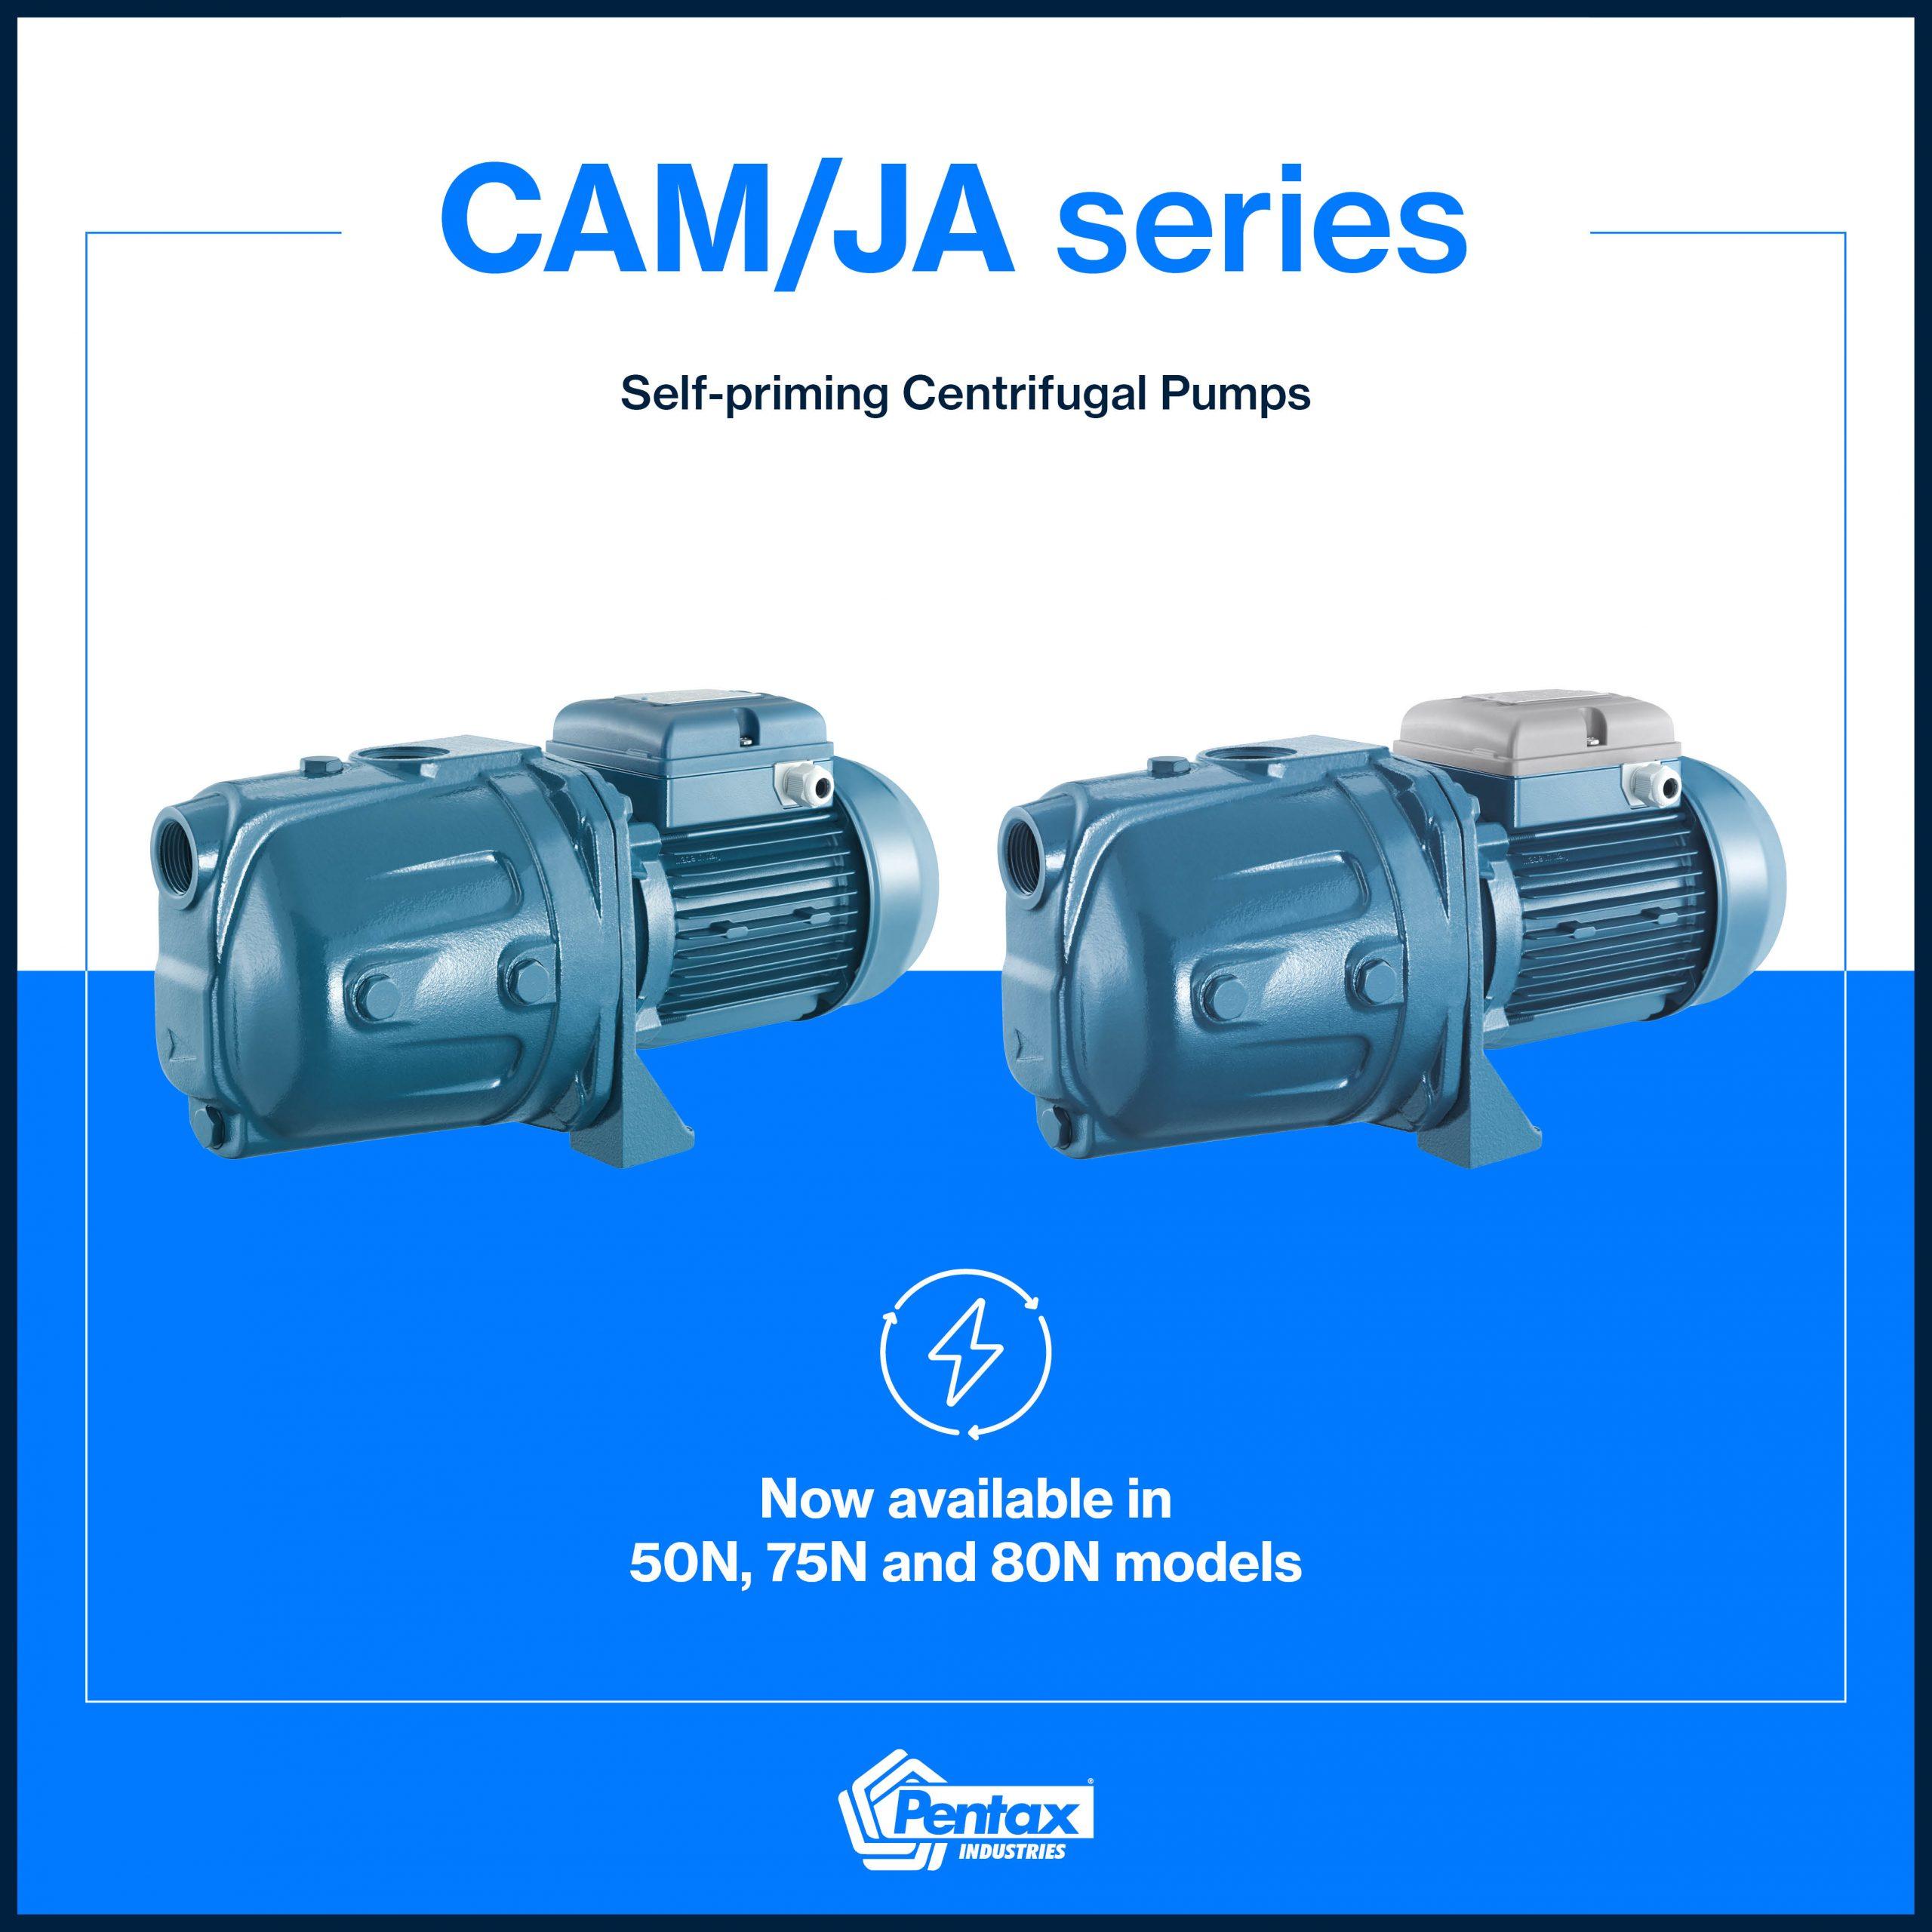 https://www.pentax-pumps.it/wp-content/uploads/2020/11/CAM-JA-new-models-scaled.jpg